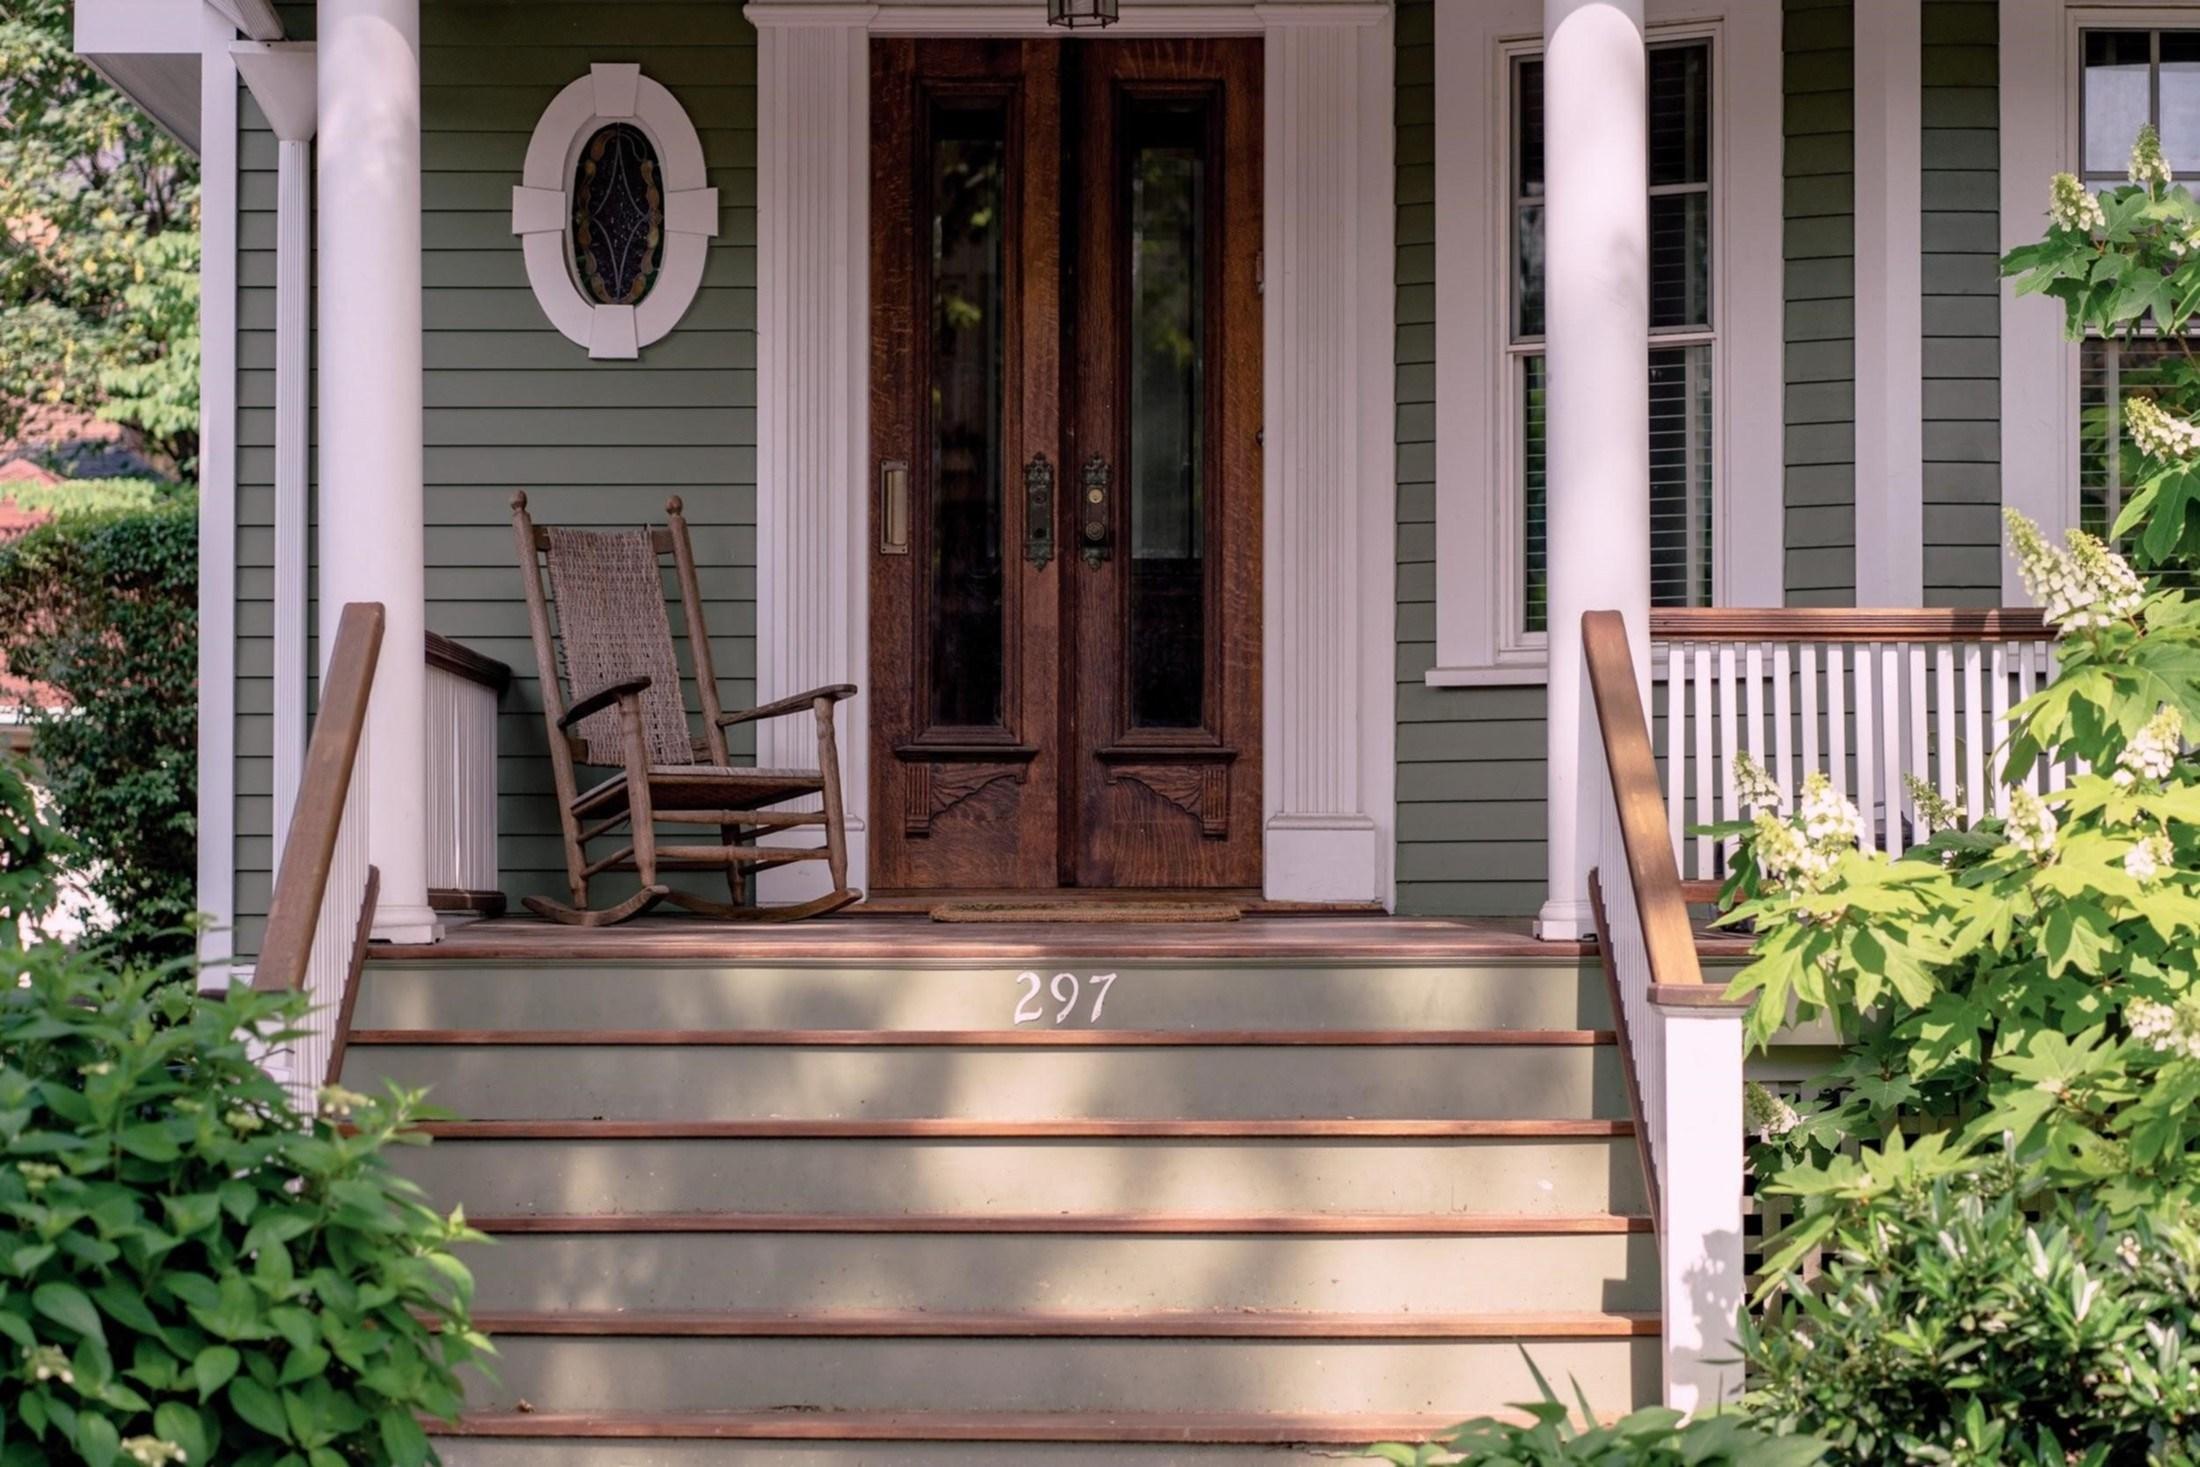 How To Build A Porch Steps For Building A Front Porch Deck   Premade Steps For Outside   Front Porch   Concrete   Wooden   Precast Concrete Steps   Deck Stairs